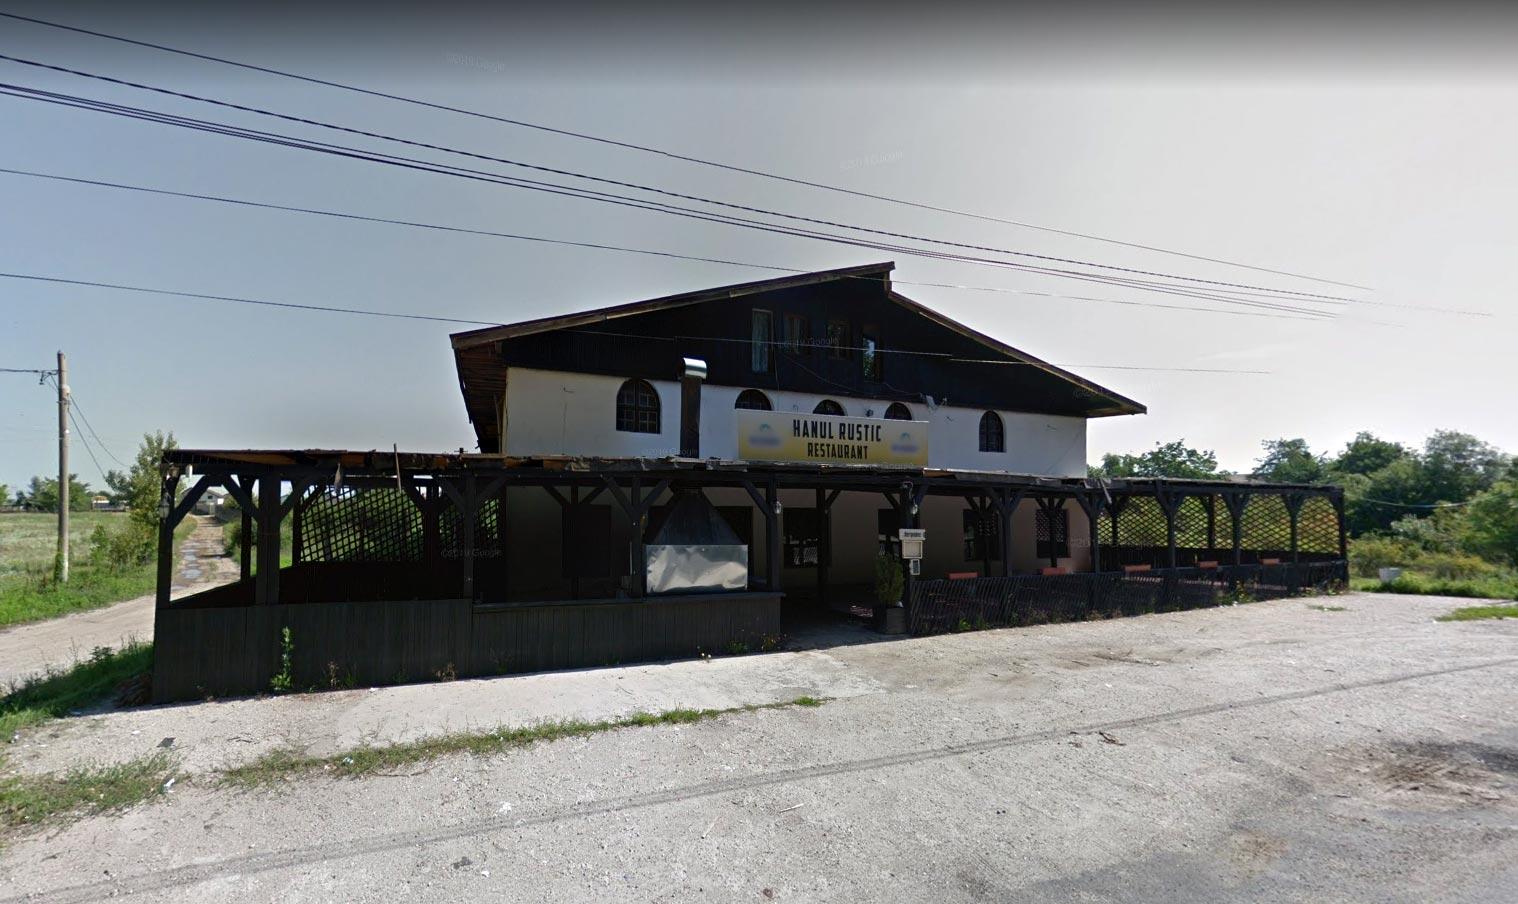 Restaurant P+E+M + teren intravilan 1.100mp, Ciorogarla, jud. Ilfov